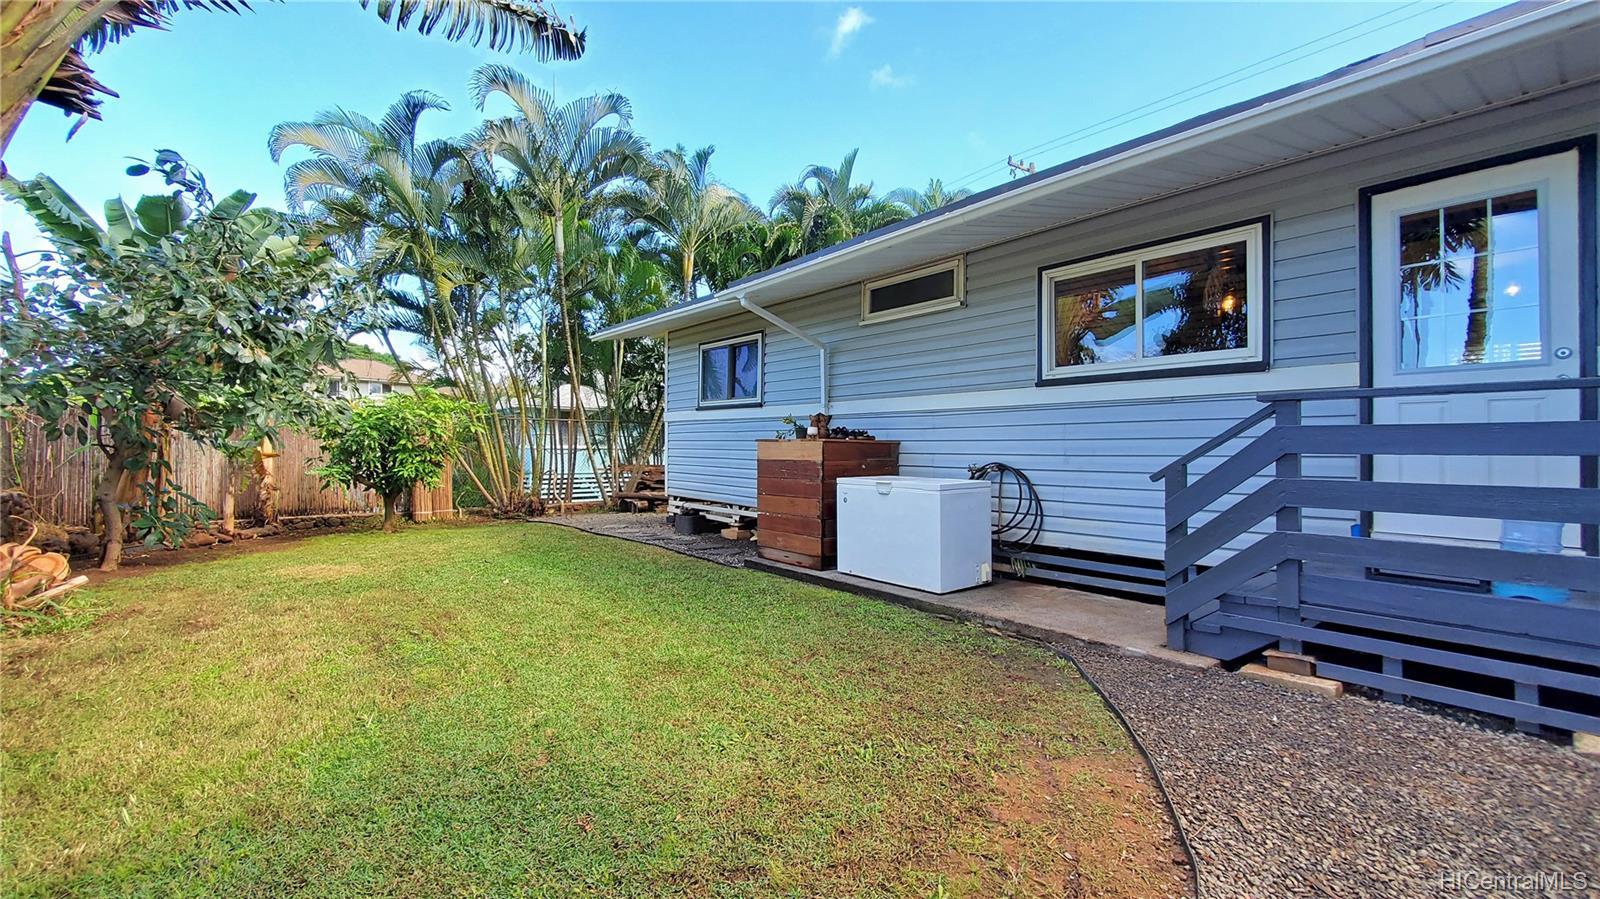 66-569  Kamehameha Hwy Waialua, North Shore home - photo 10 of 24